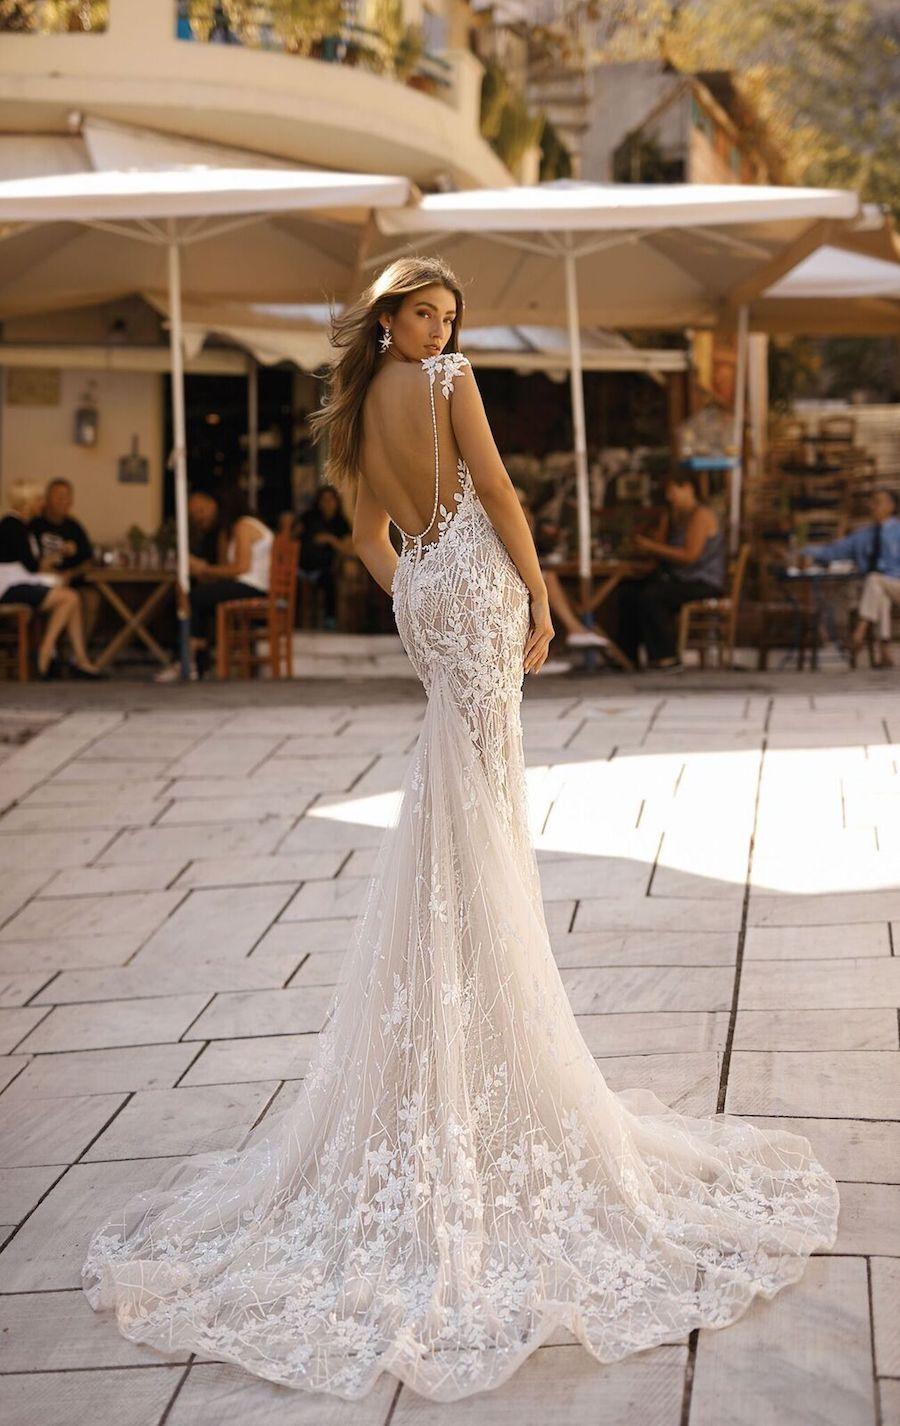 Wedding Dress Inspiration - Berta - MODwedding #bertaweddingdress